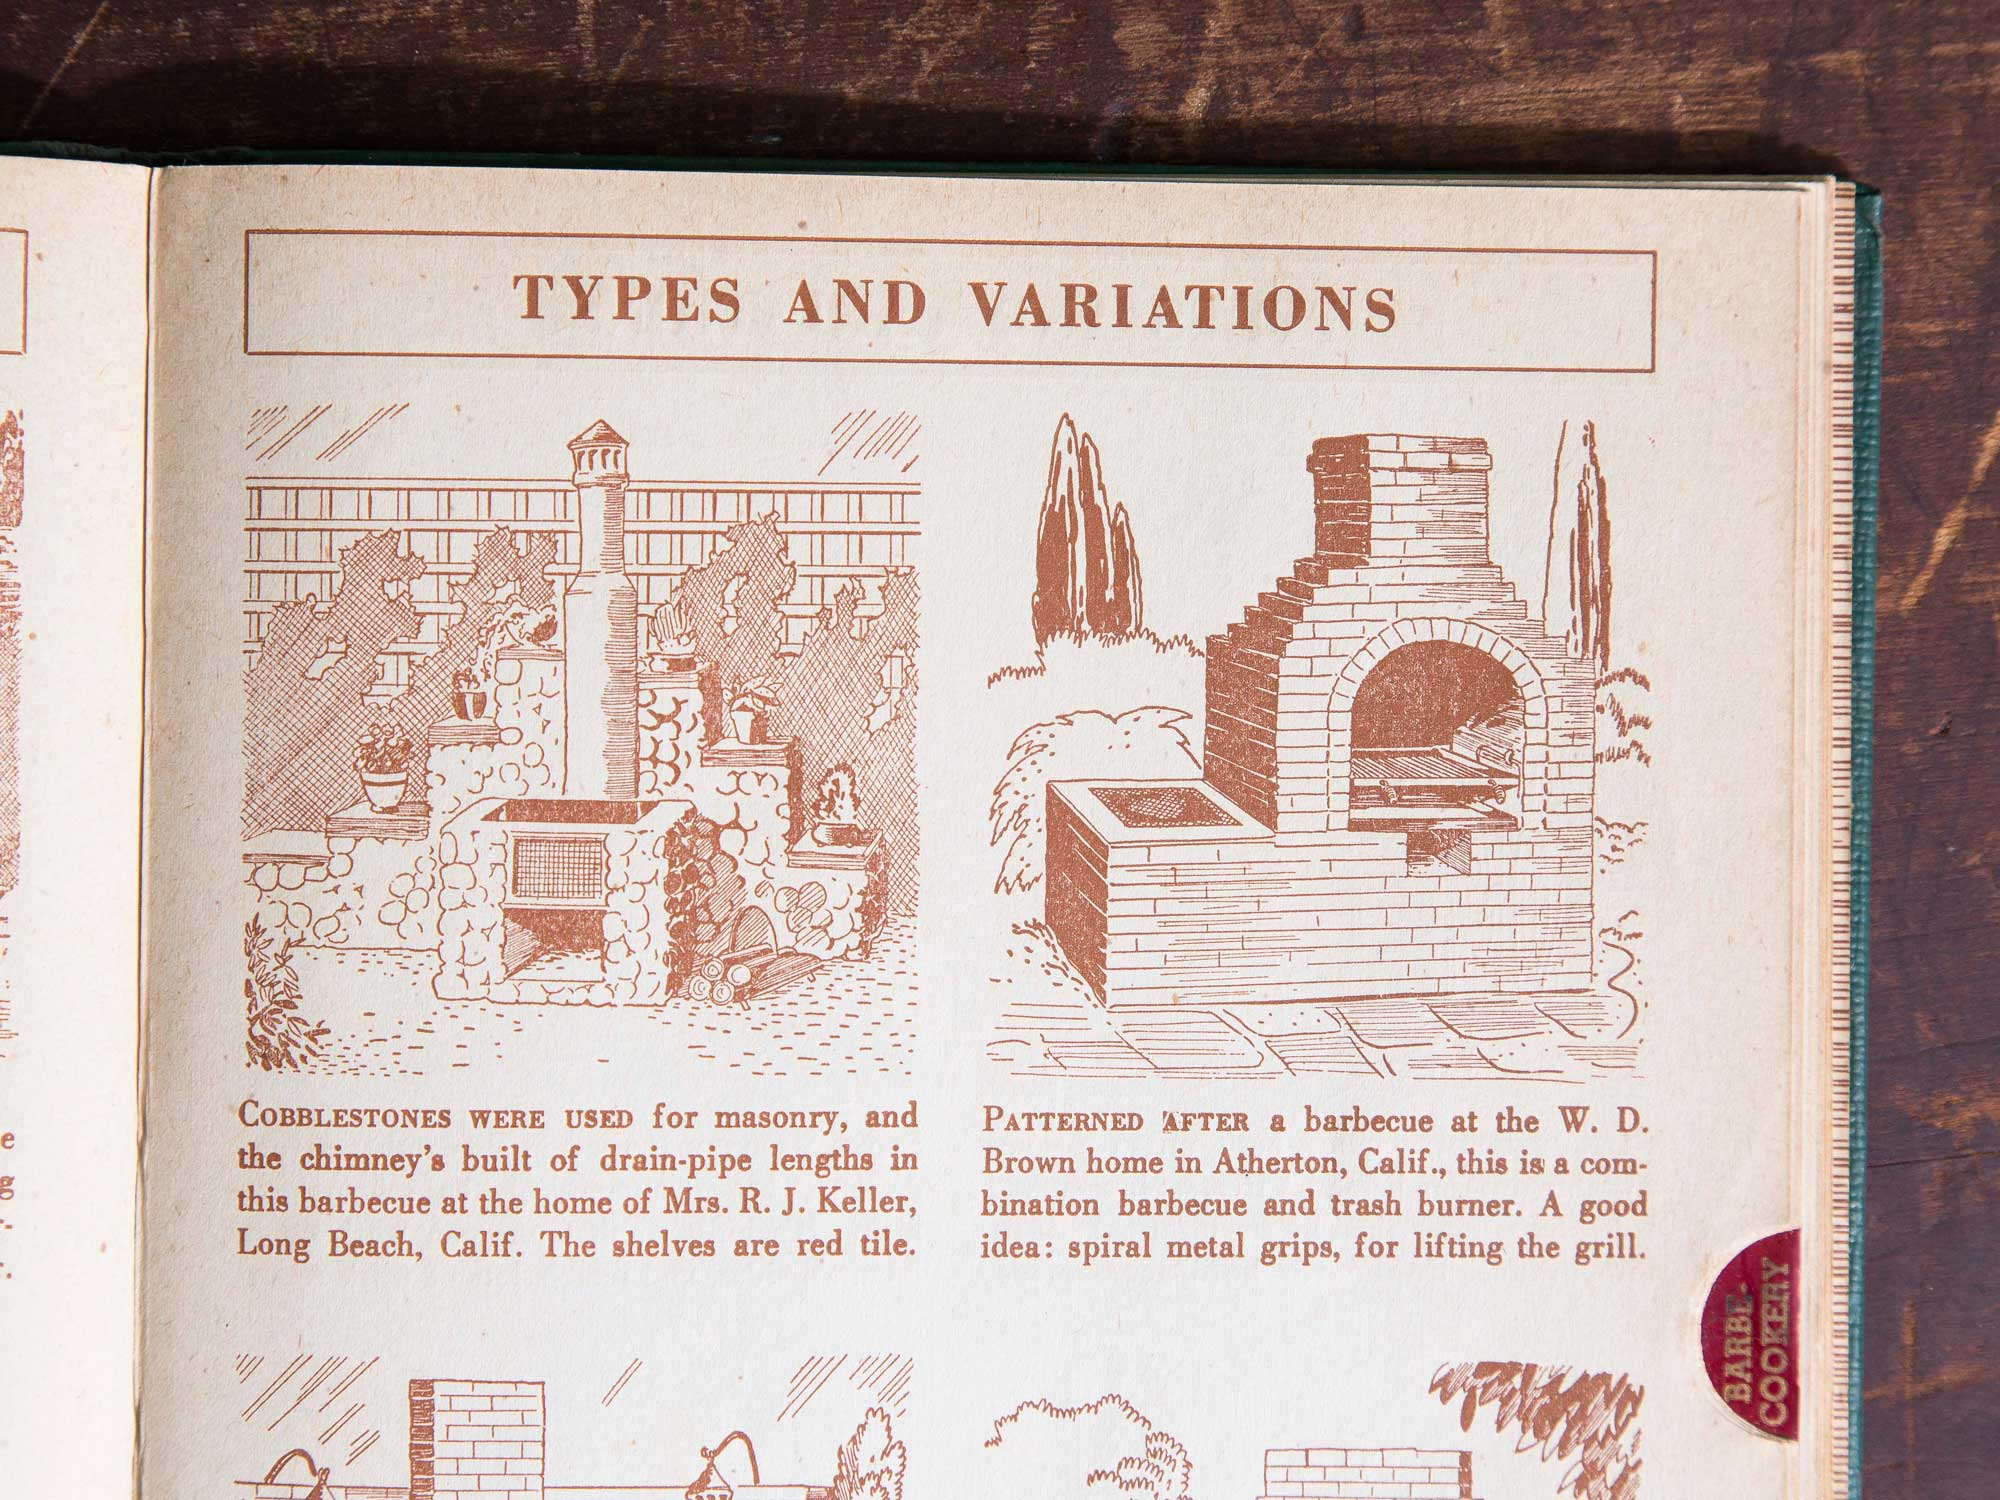 Pore Over the Meticulous Diagrams in the Original Barbecue Cookbook